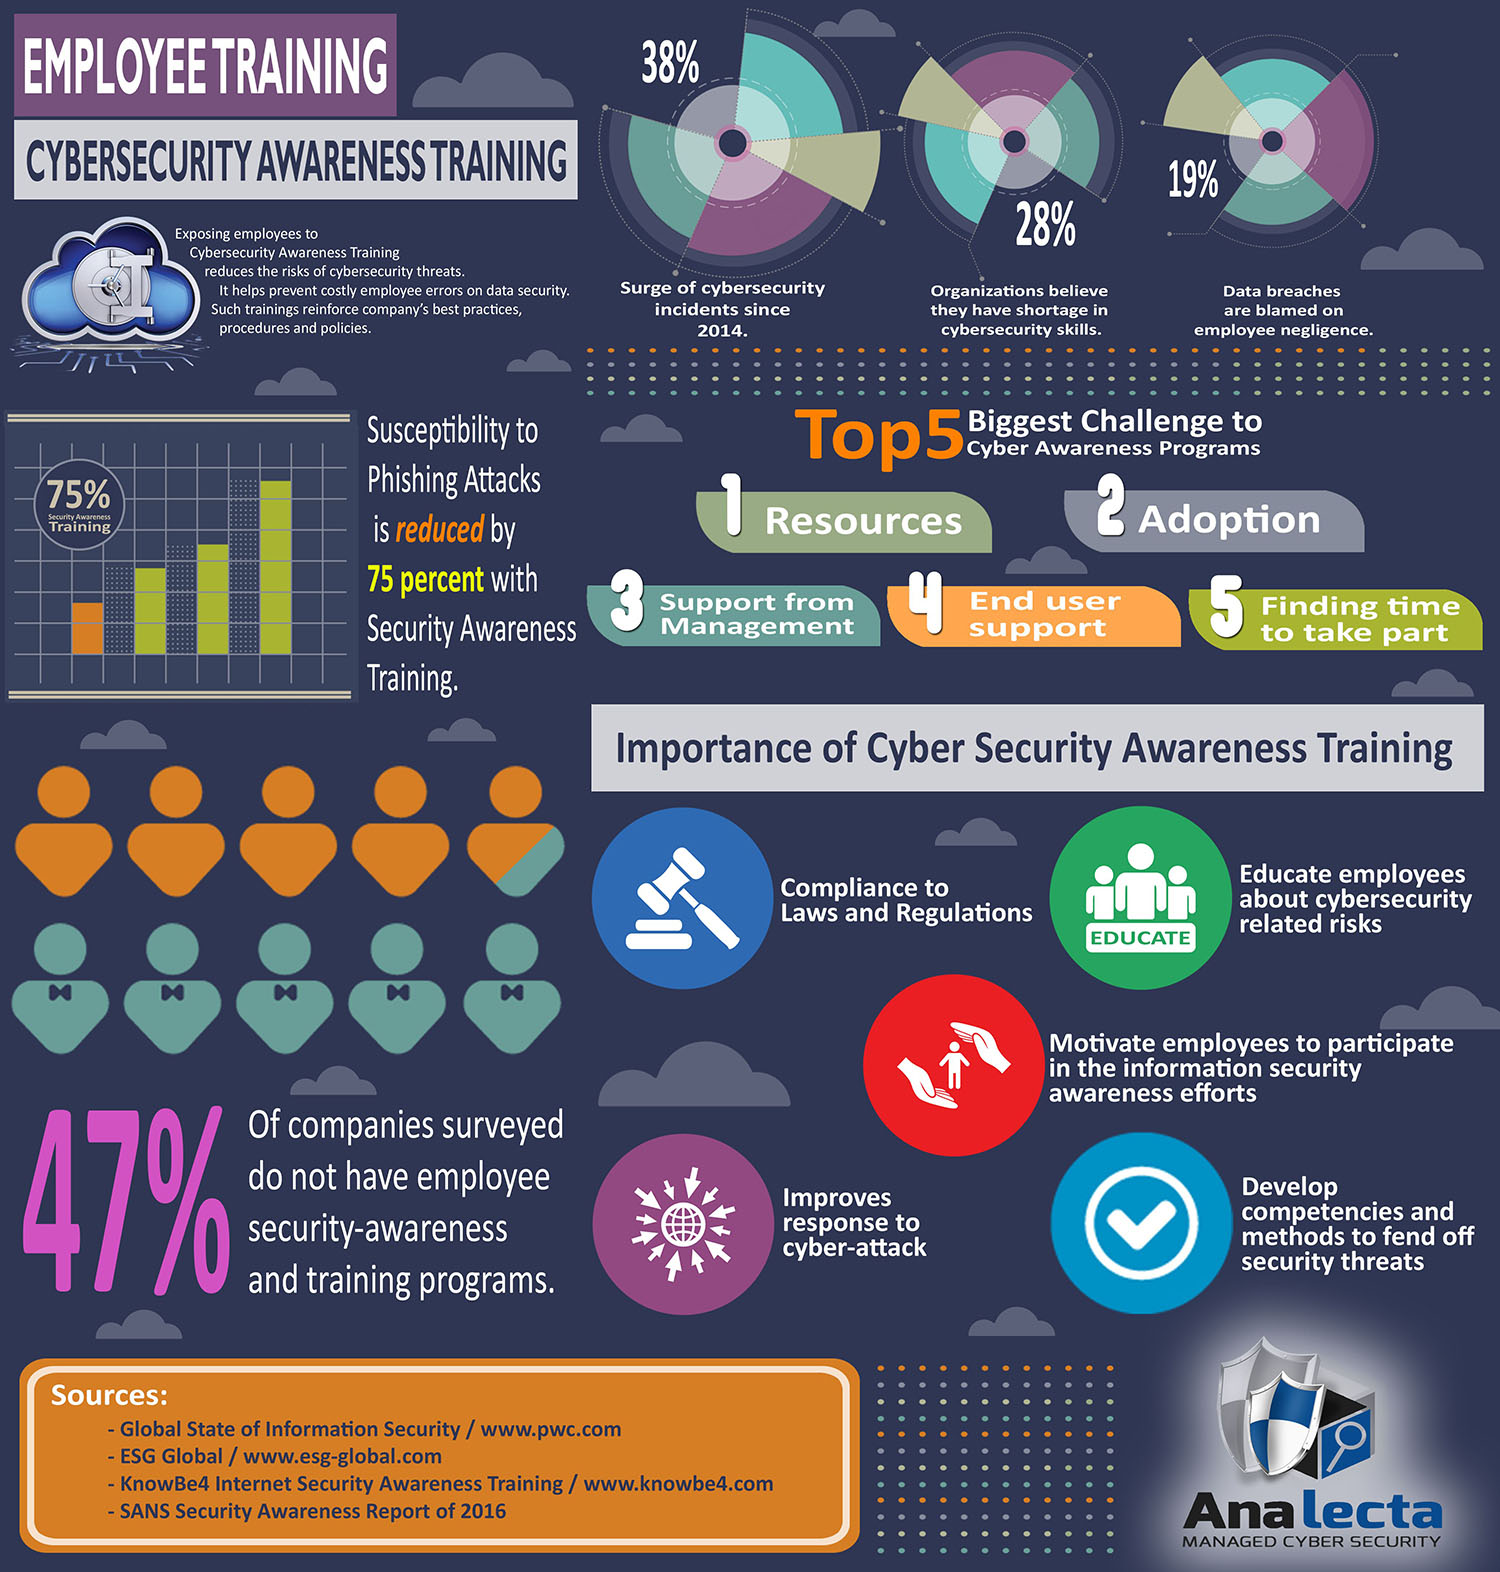 Employee training - cybersecurity awareness training